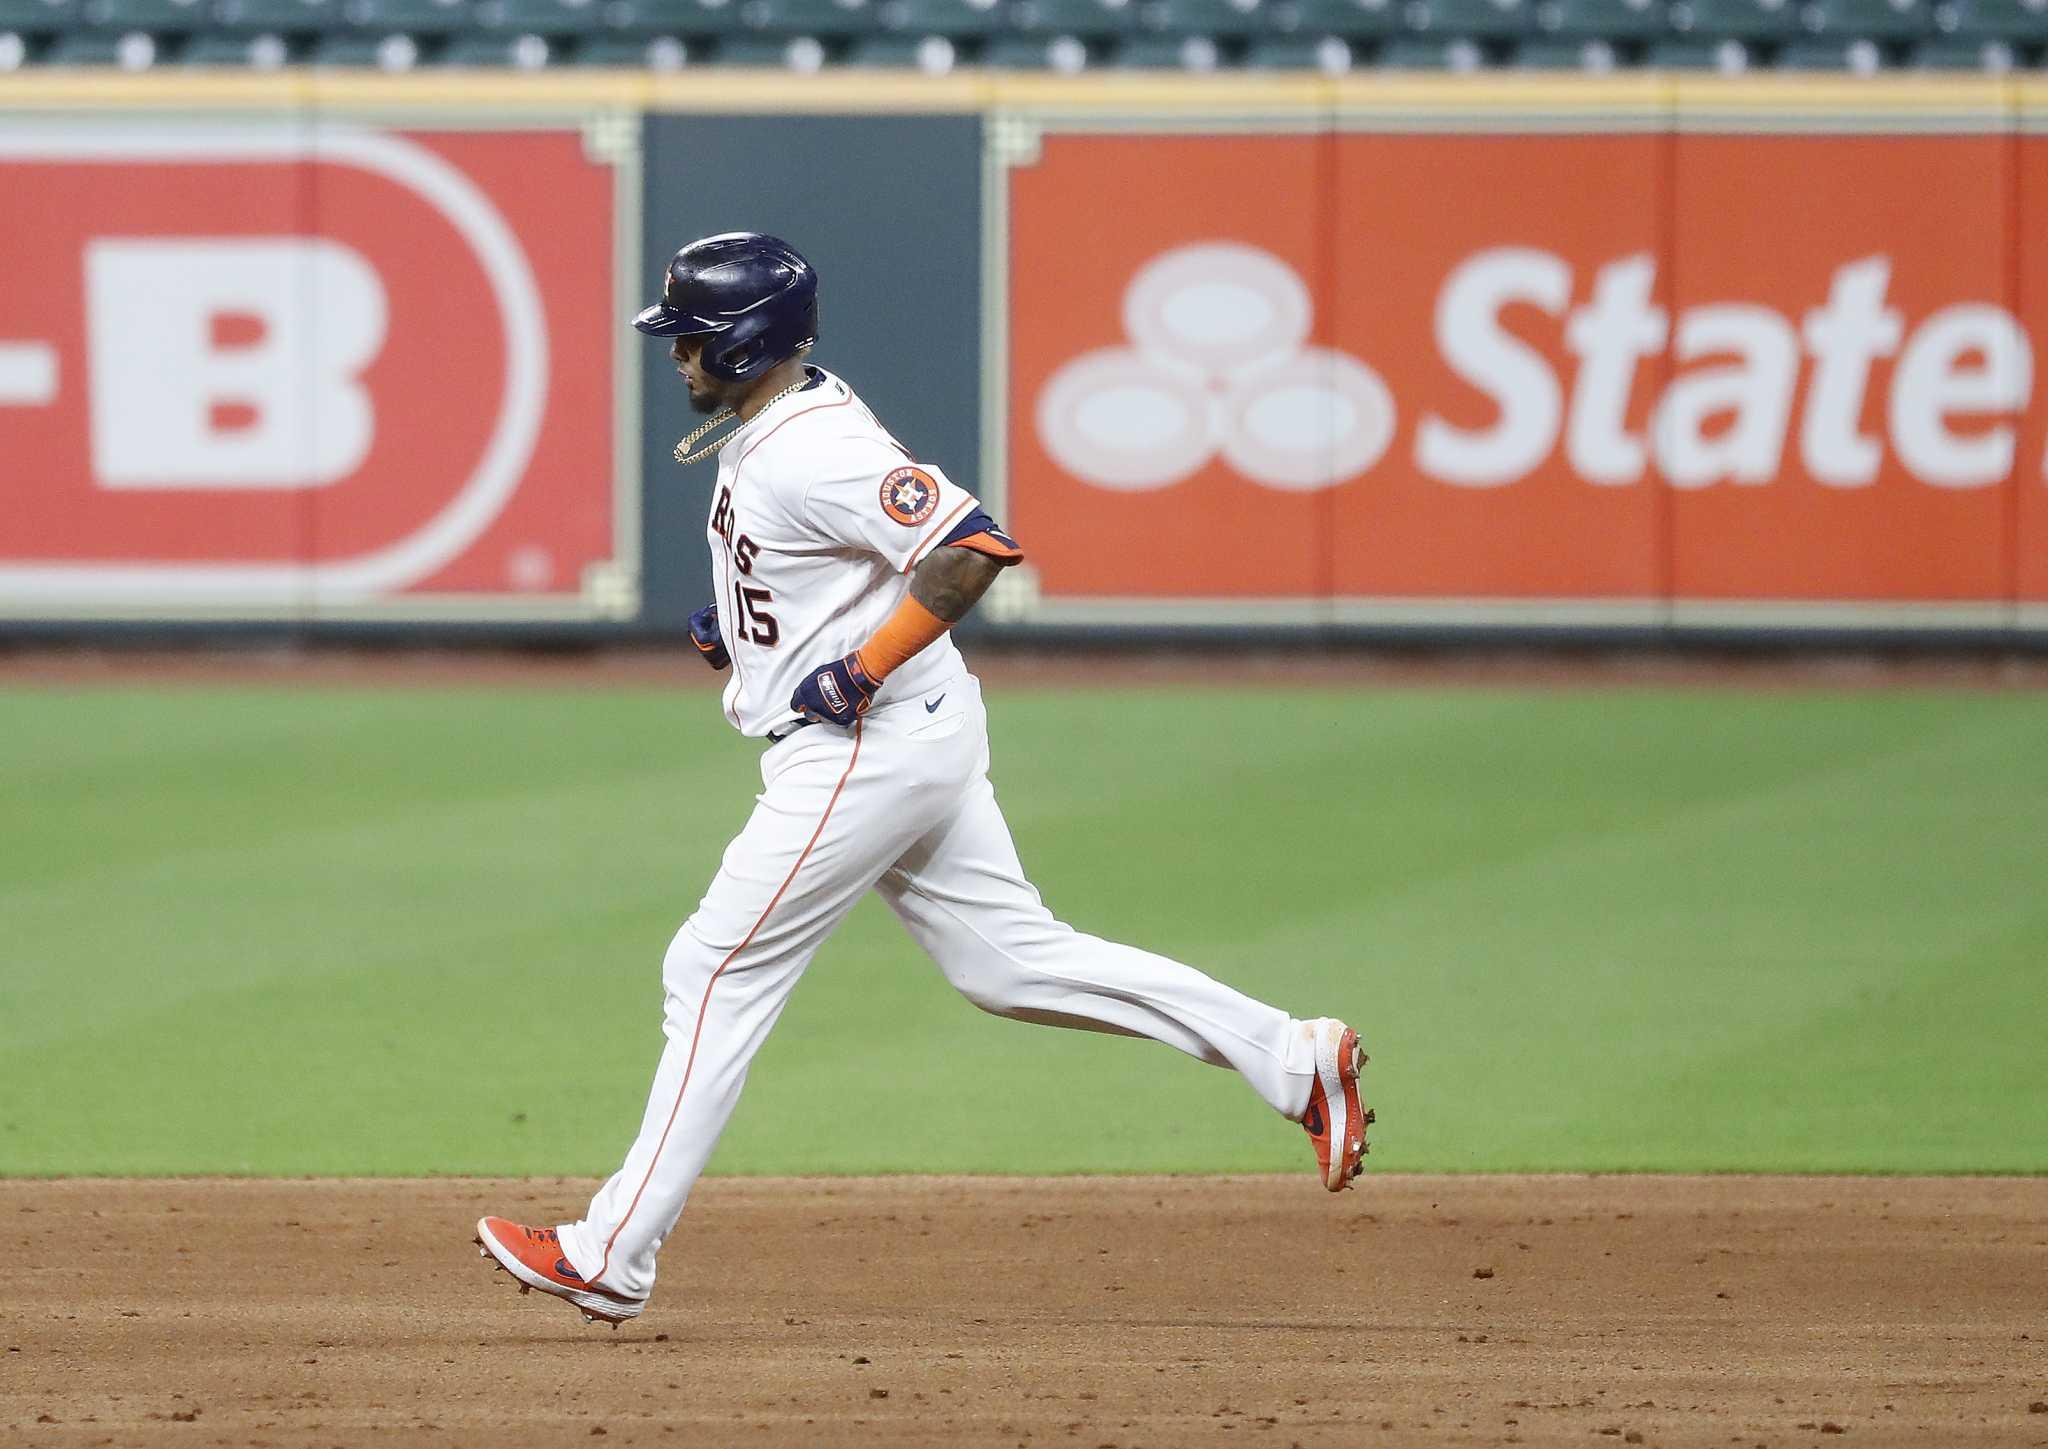 Maldonado's 3-run shot leads Astros over Giants